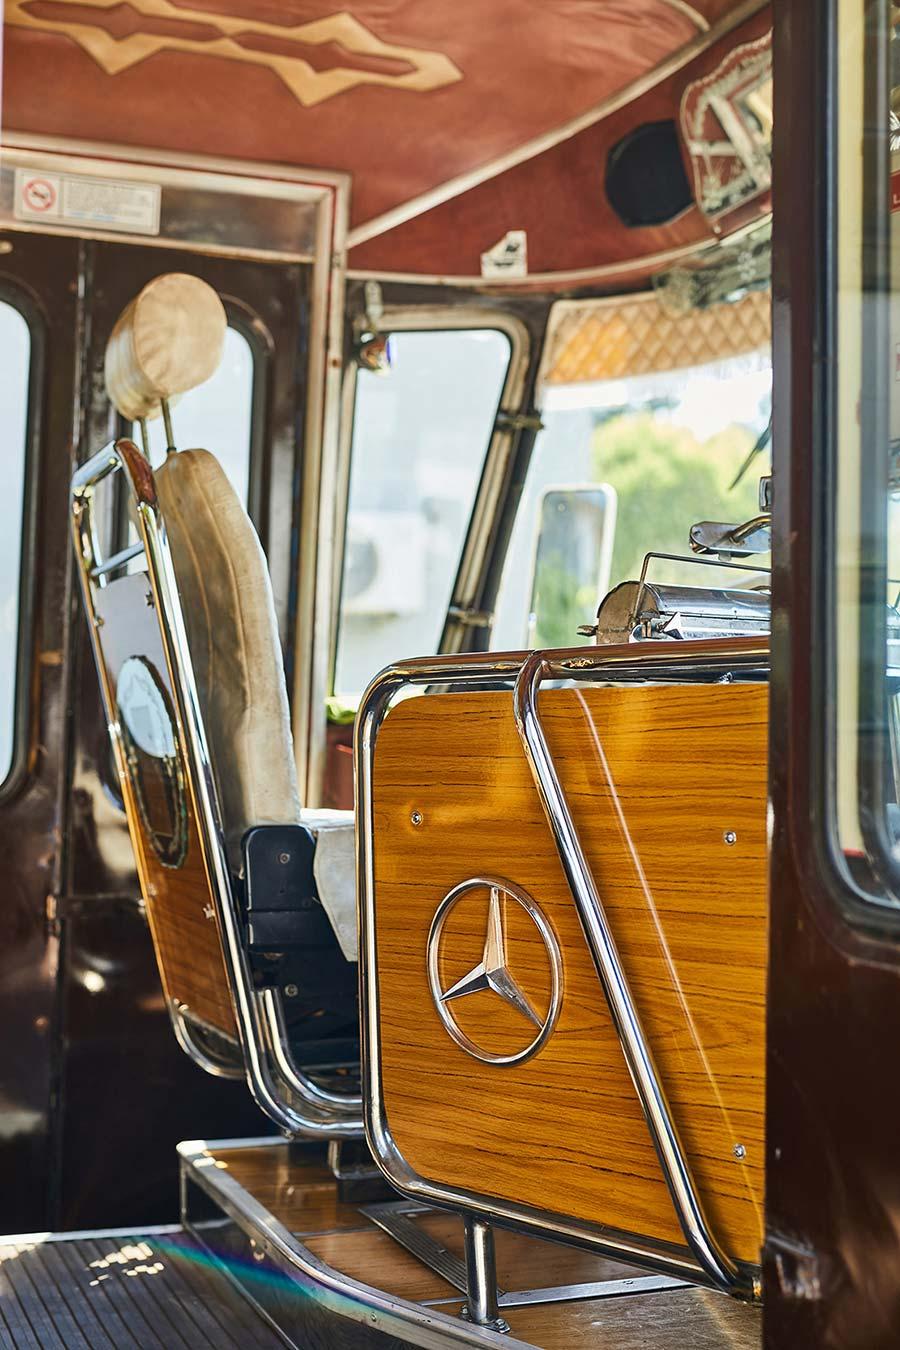 Butaca chofer Mercedes-Benz LO 1114